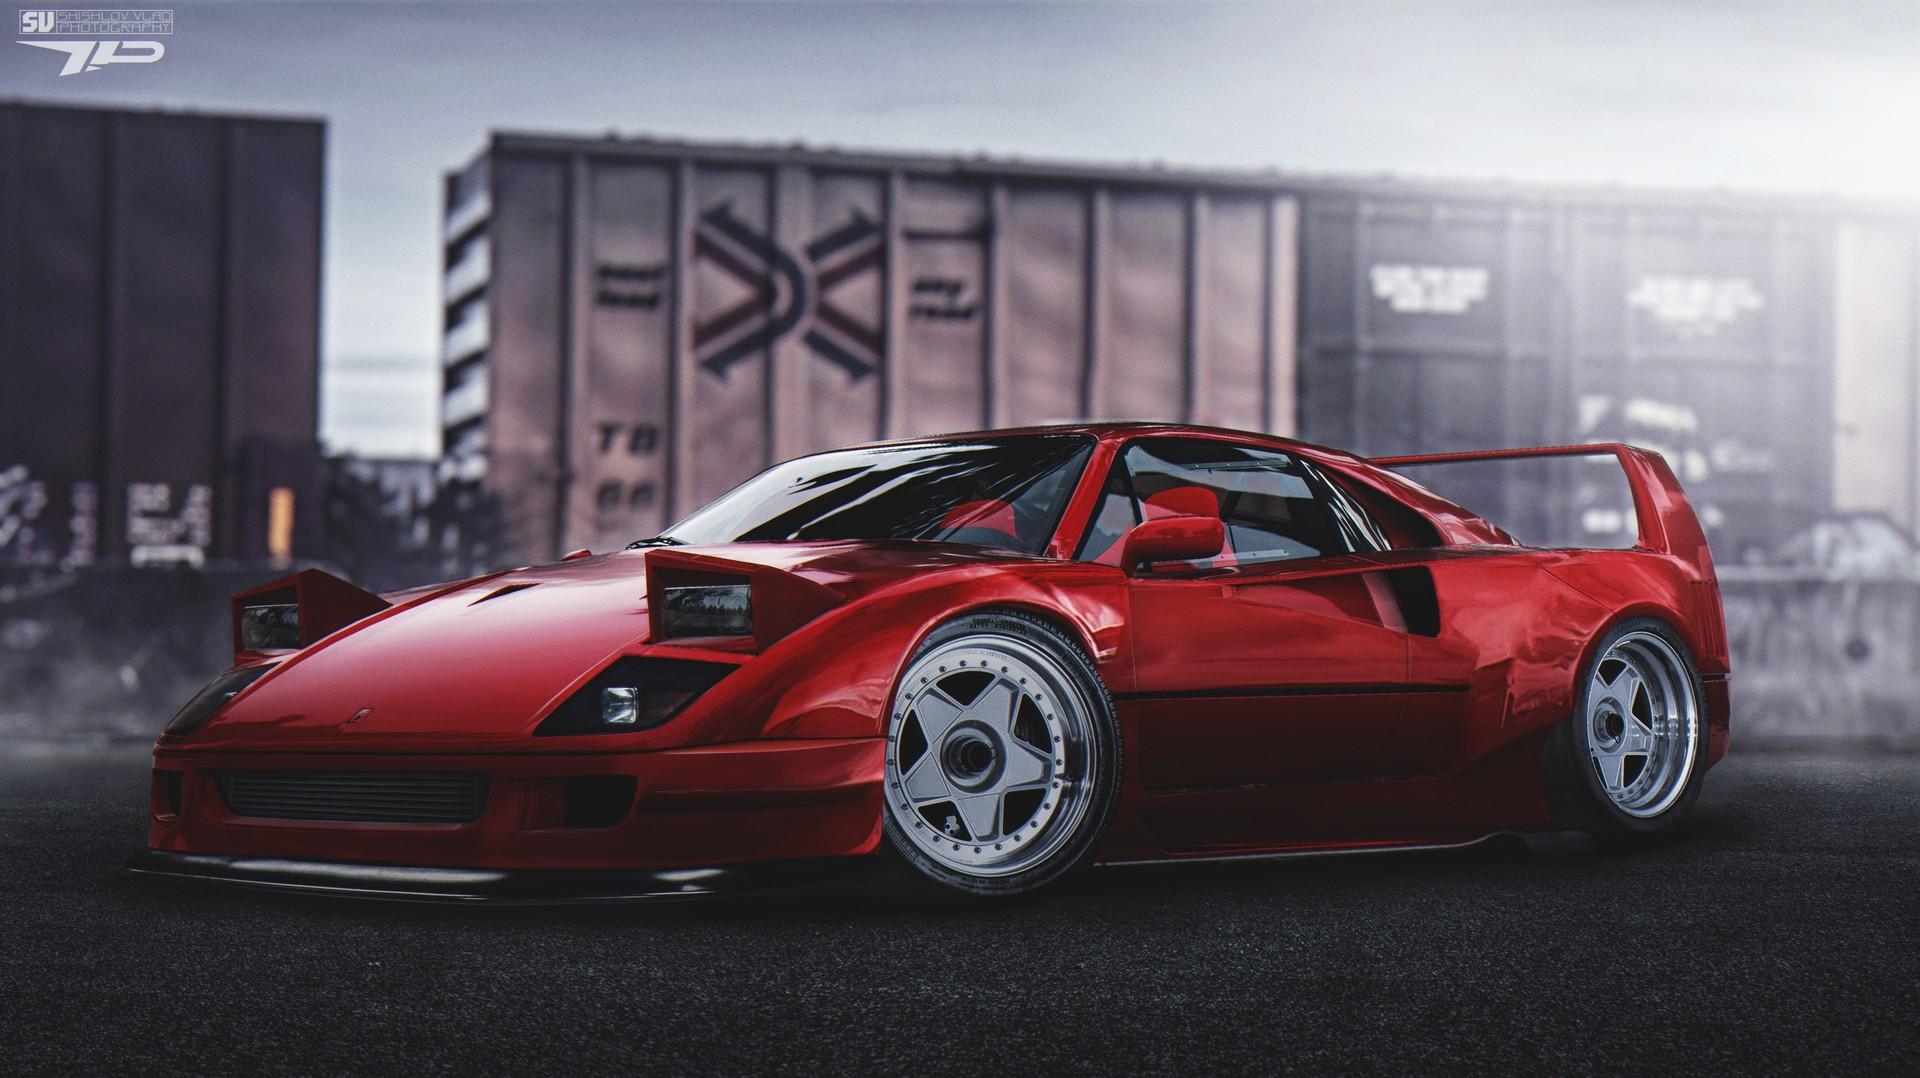 Draft Sajen Virtual Tuning Legends 90s Ferrari F40